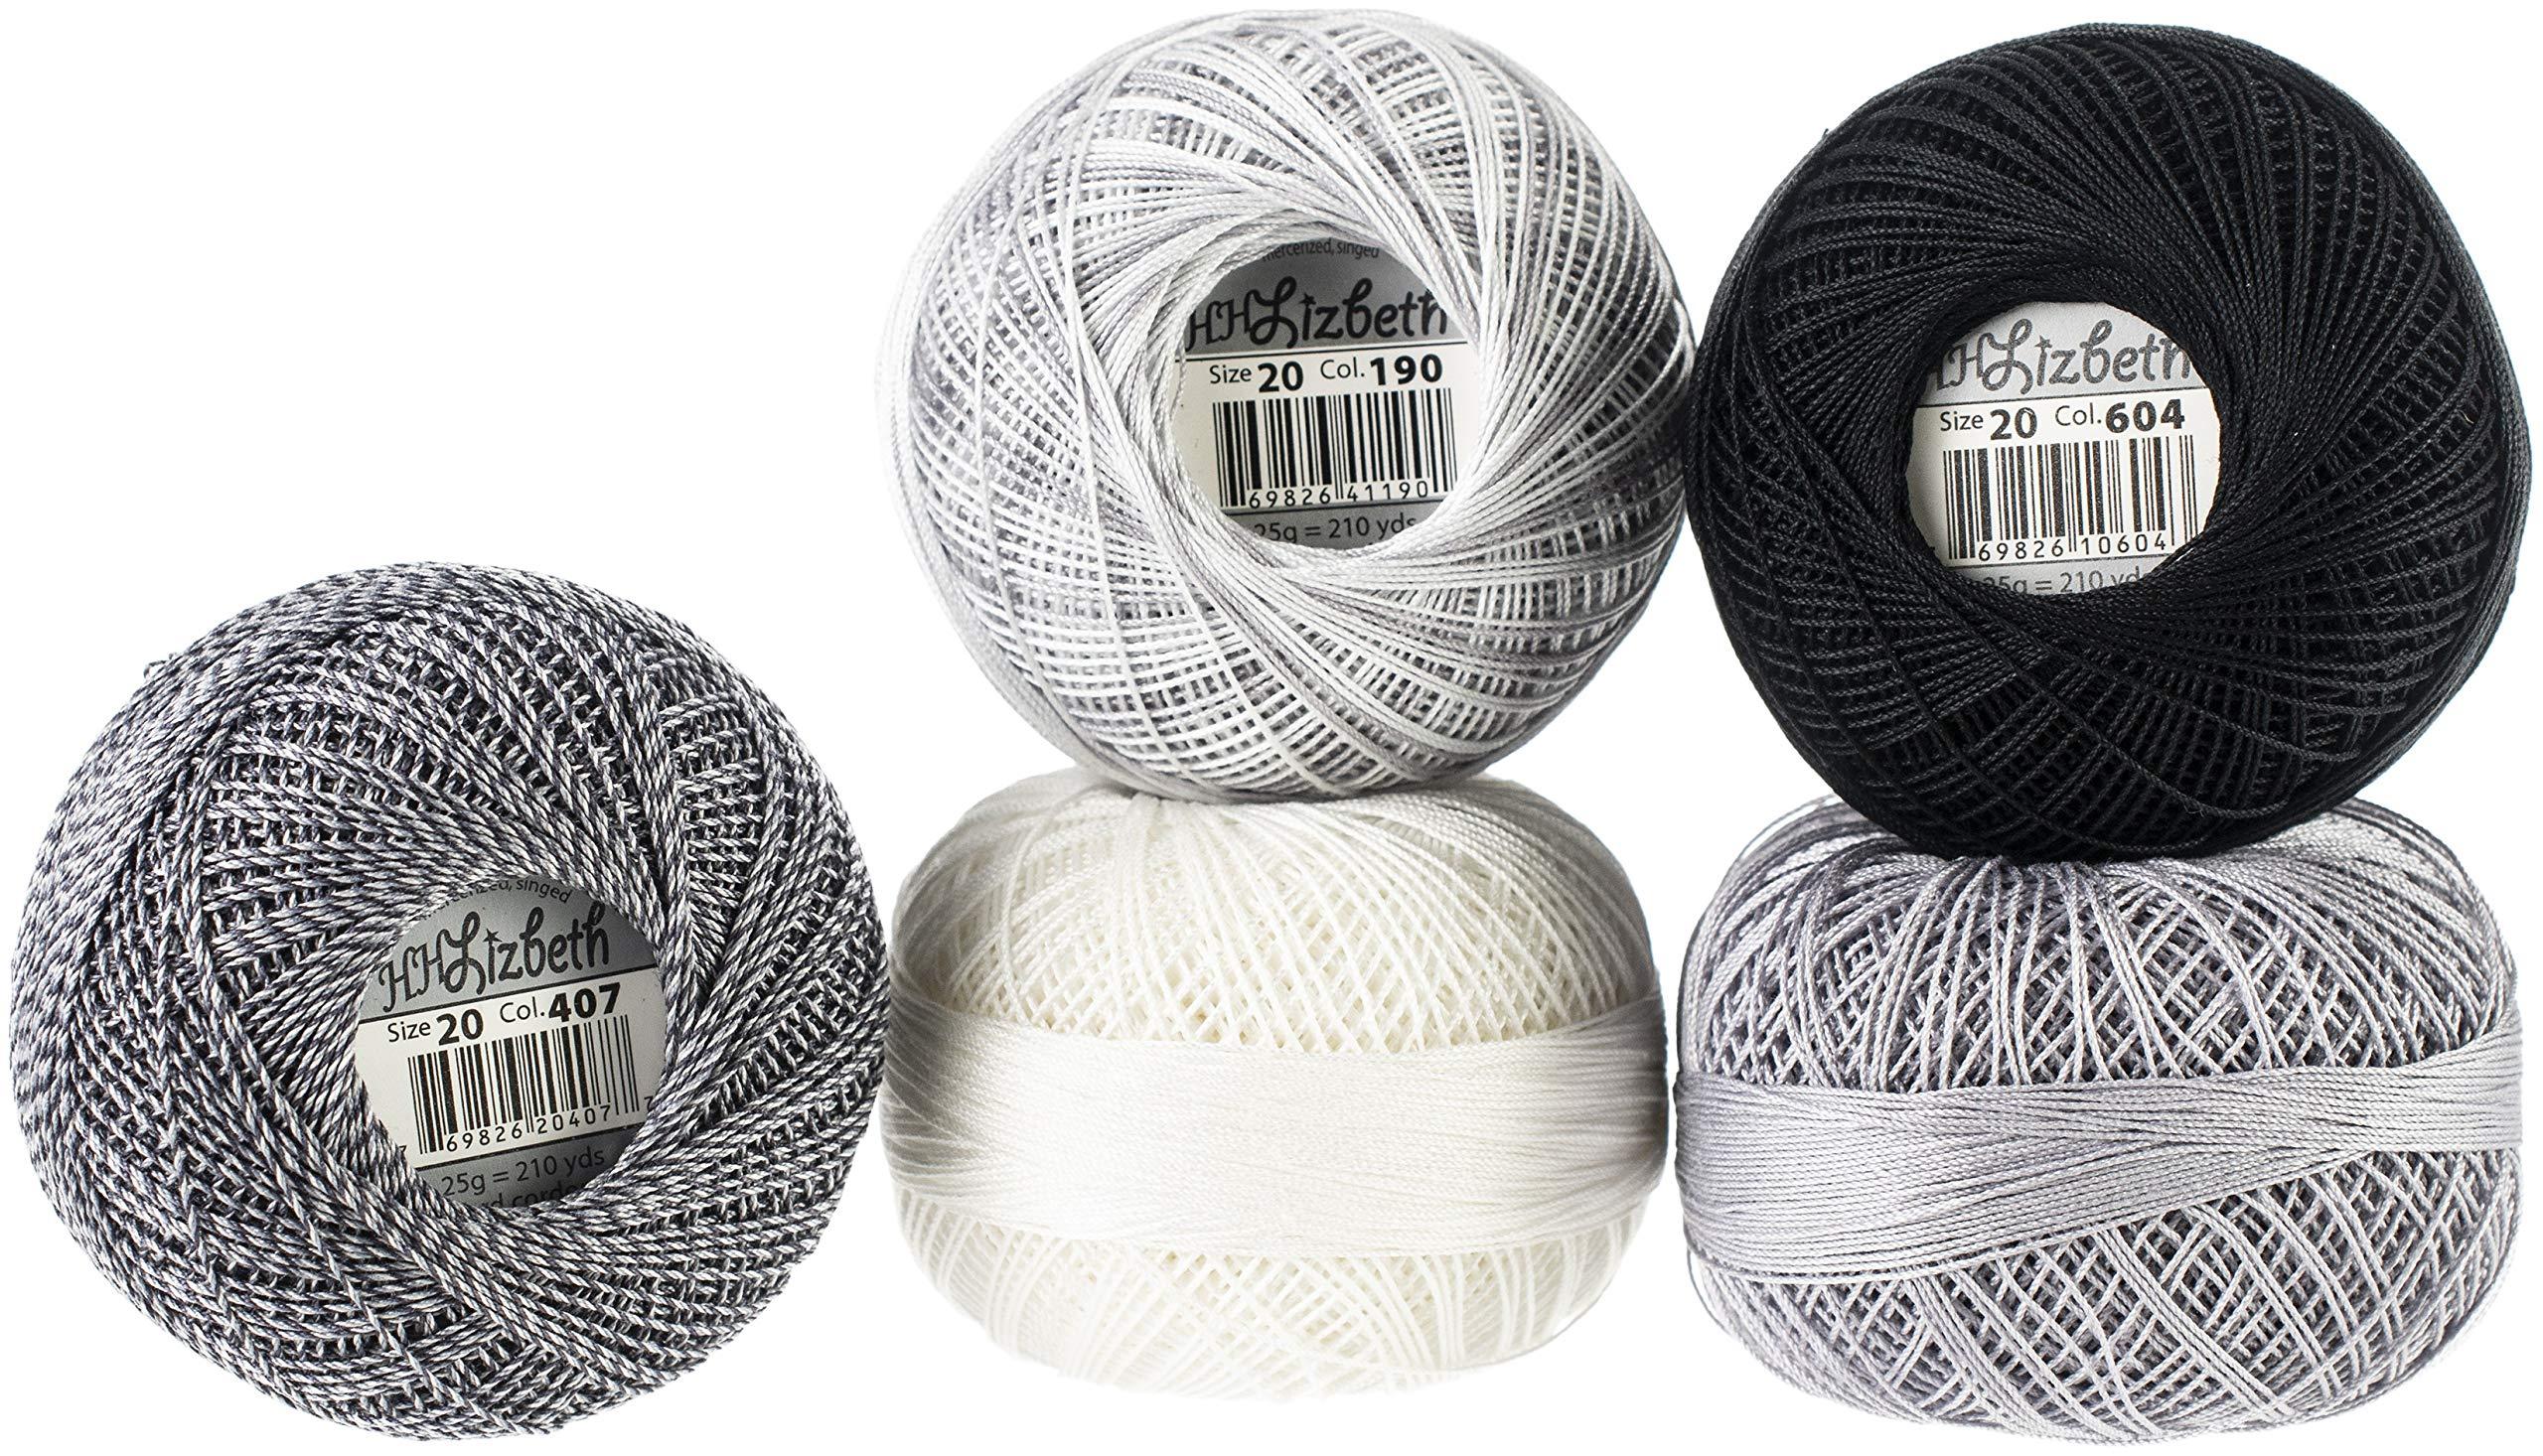 Handy Hands Lizbeth Specialty Pack Cordonnet Cotton Size 20-Silver Clouds 5/Pkg by Handy Hands (Image #1)